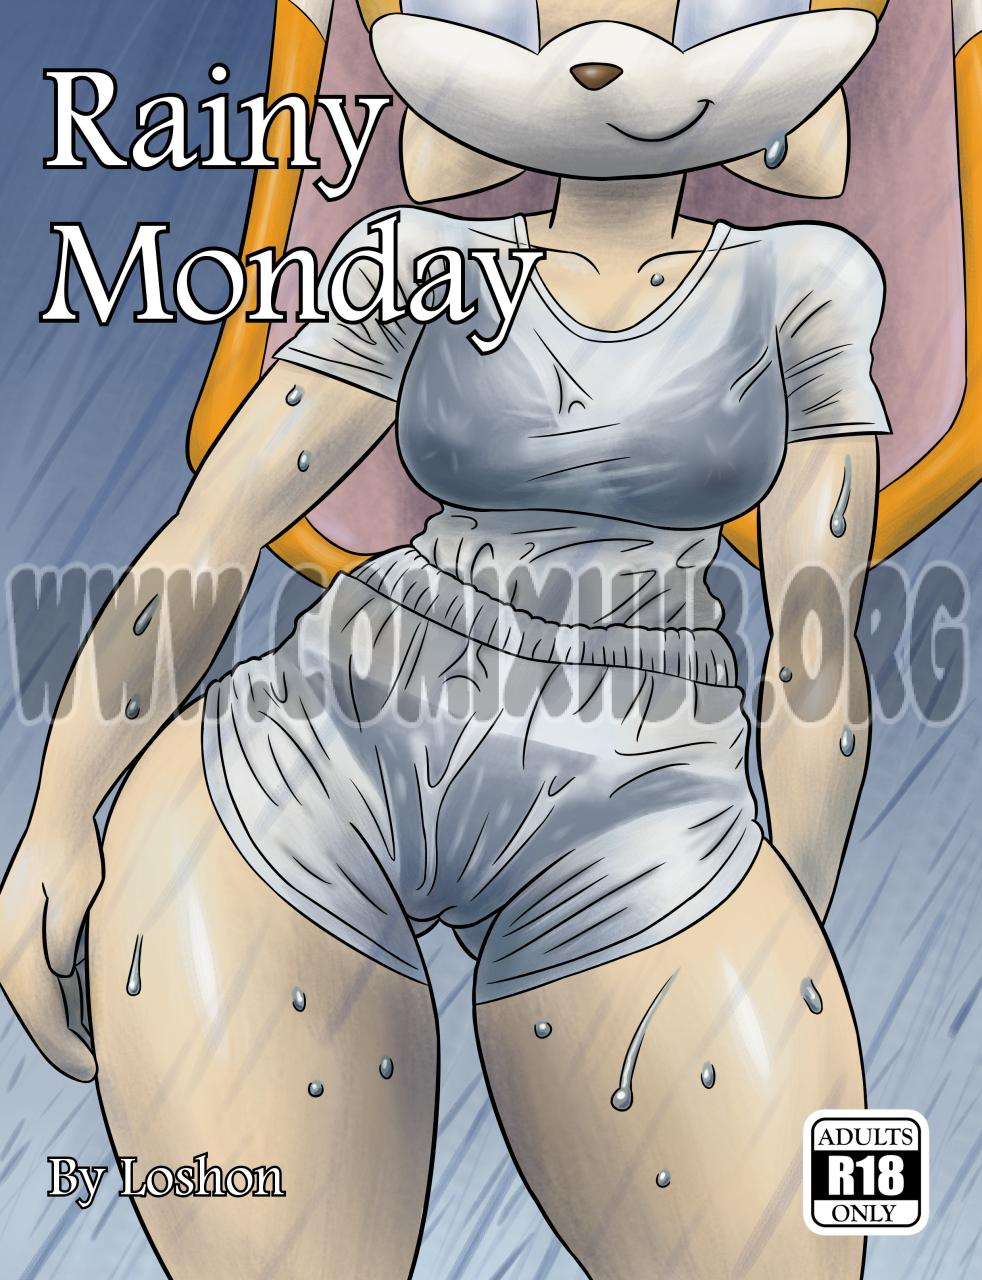 Rainy Monday porn comics Oral sex, Blowjob, Lolicon, Straight Shota